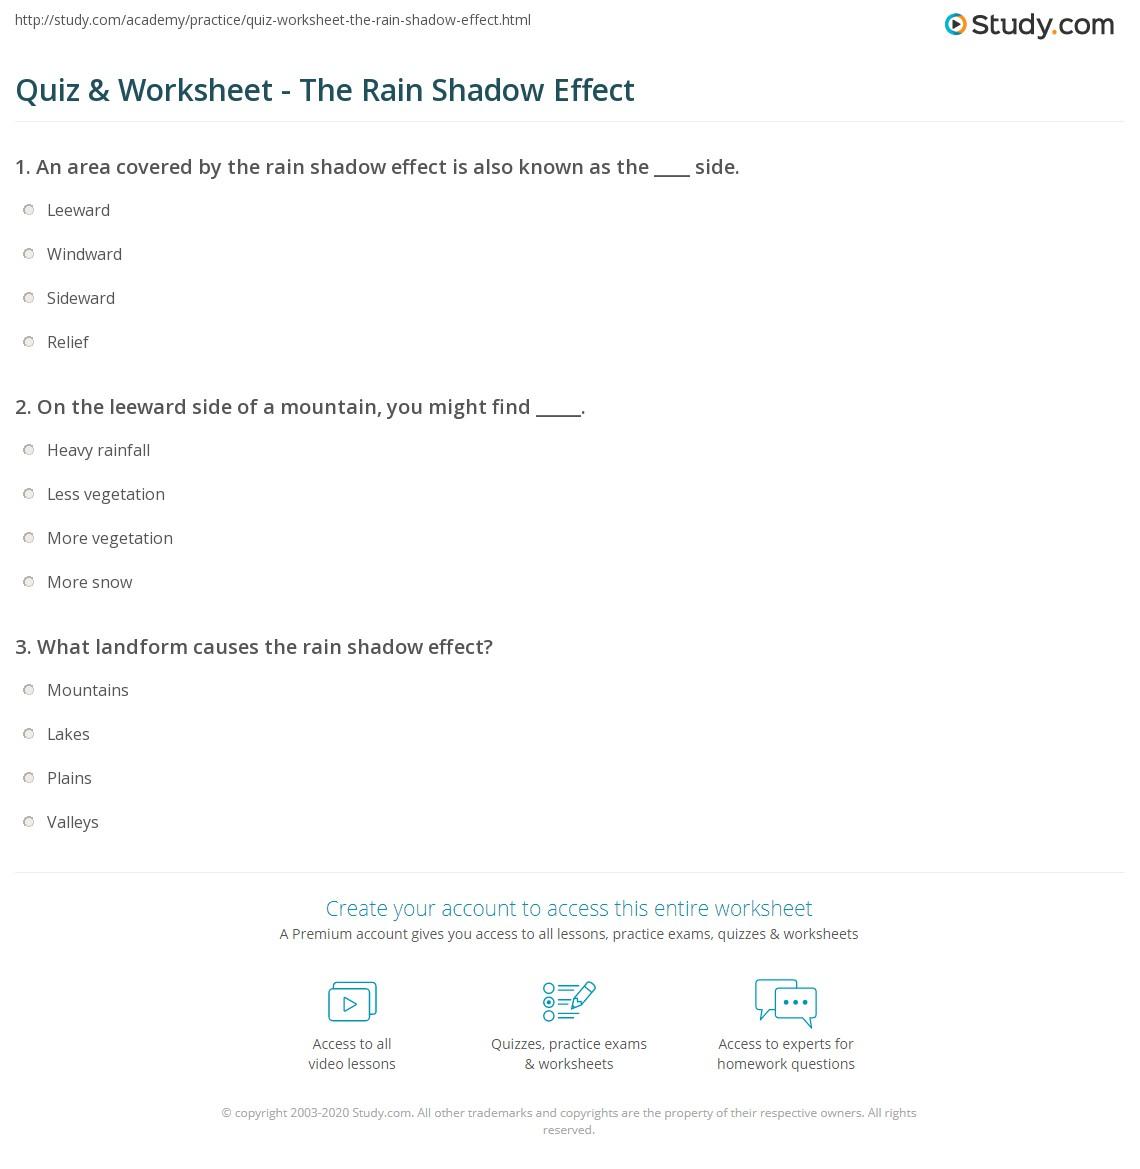 Quiz & Worksheet - The Rain Shadow Effect | Study.com